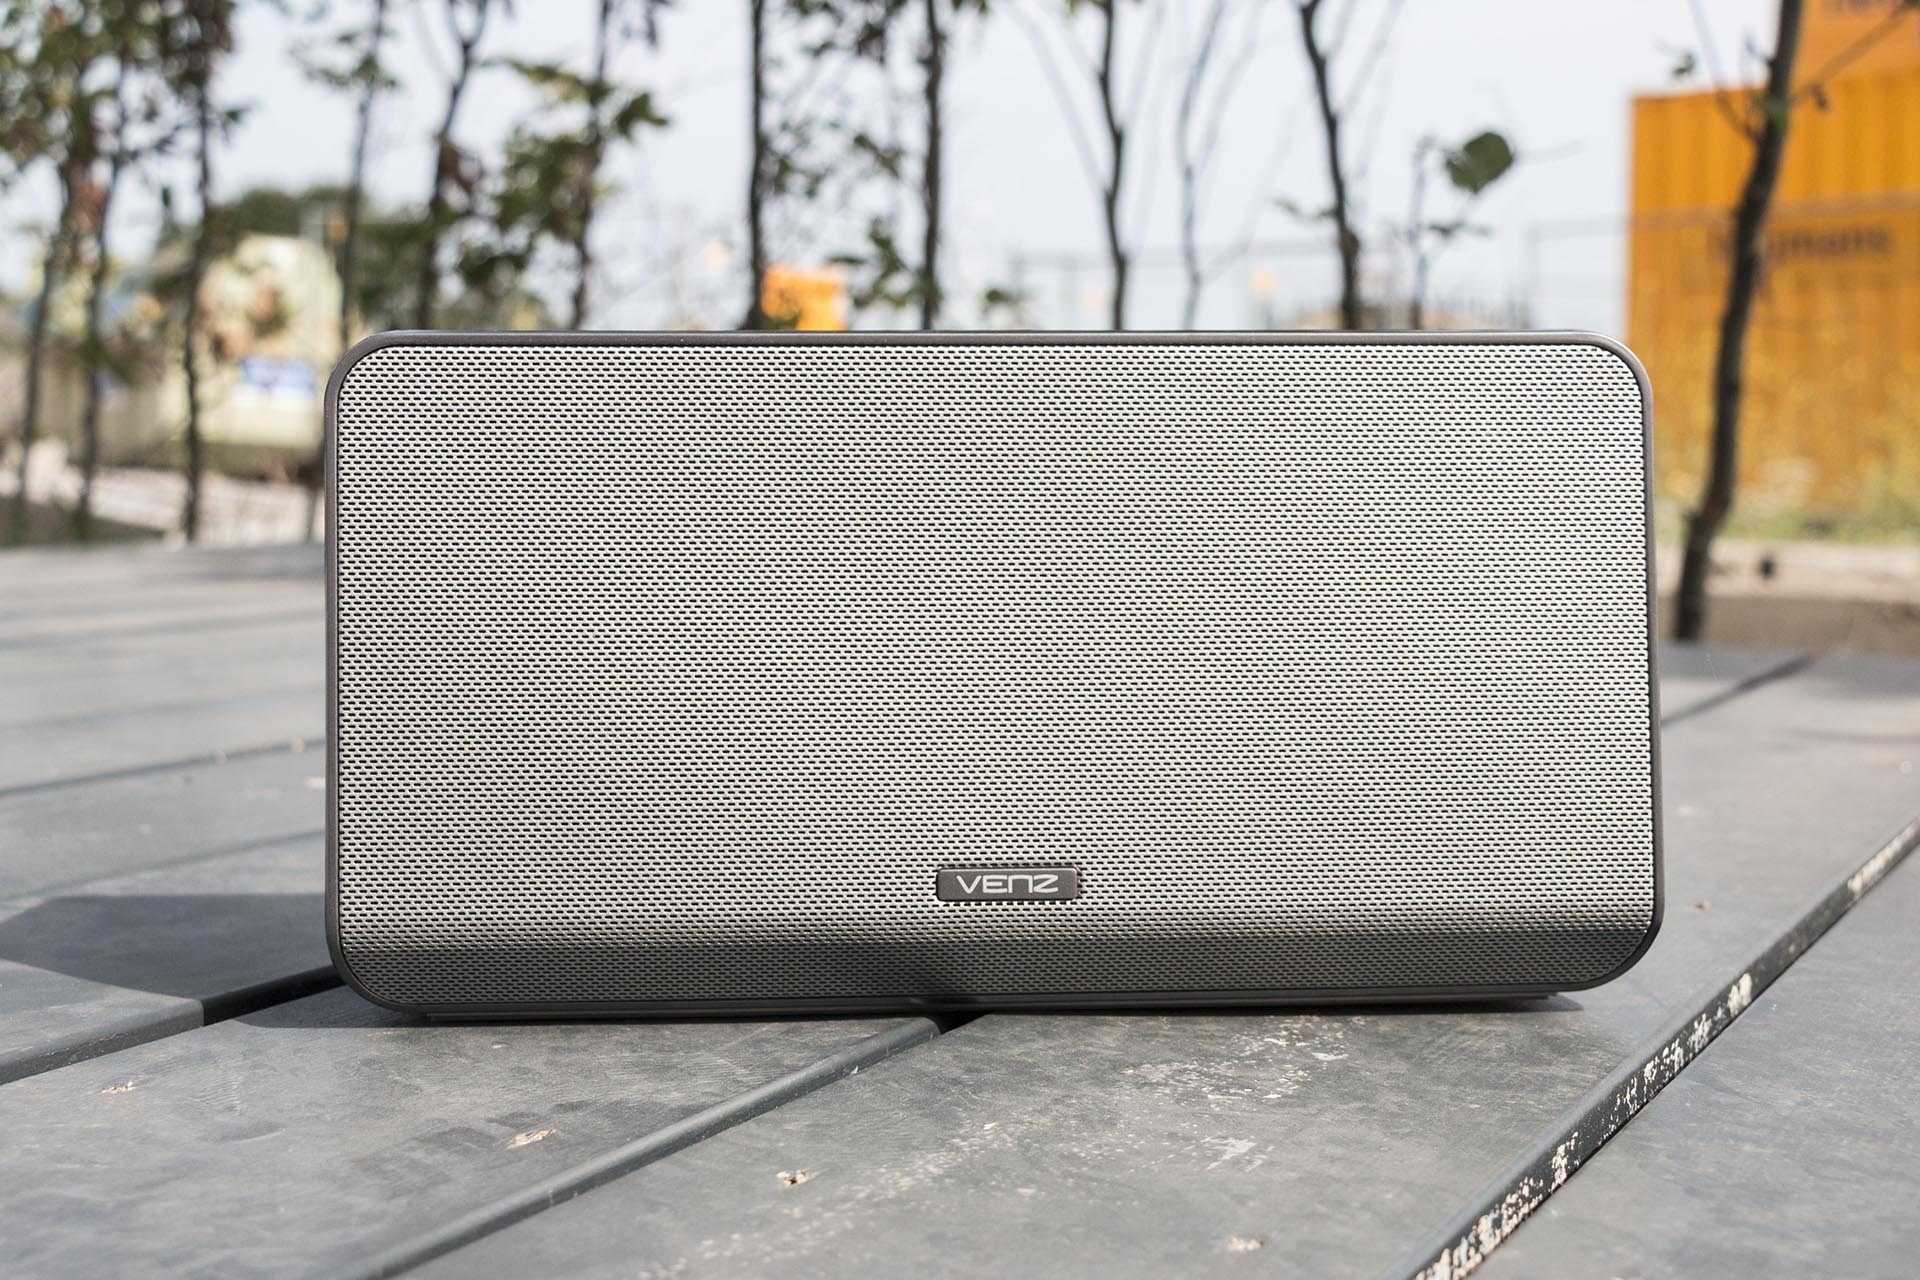 Venztech Venz A501 Multiroom Speaker